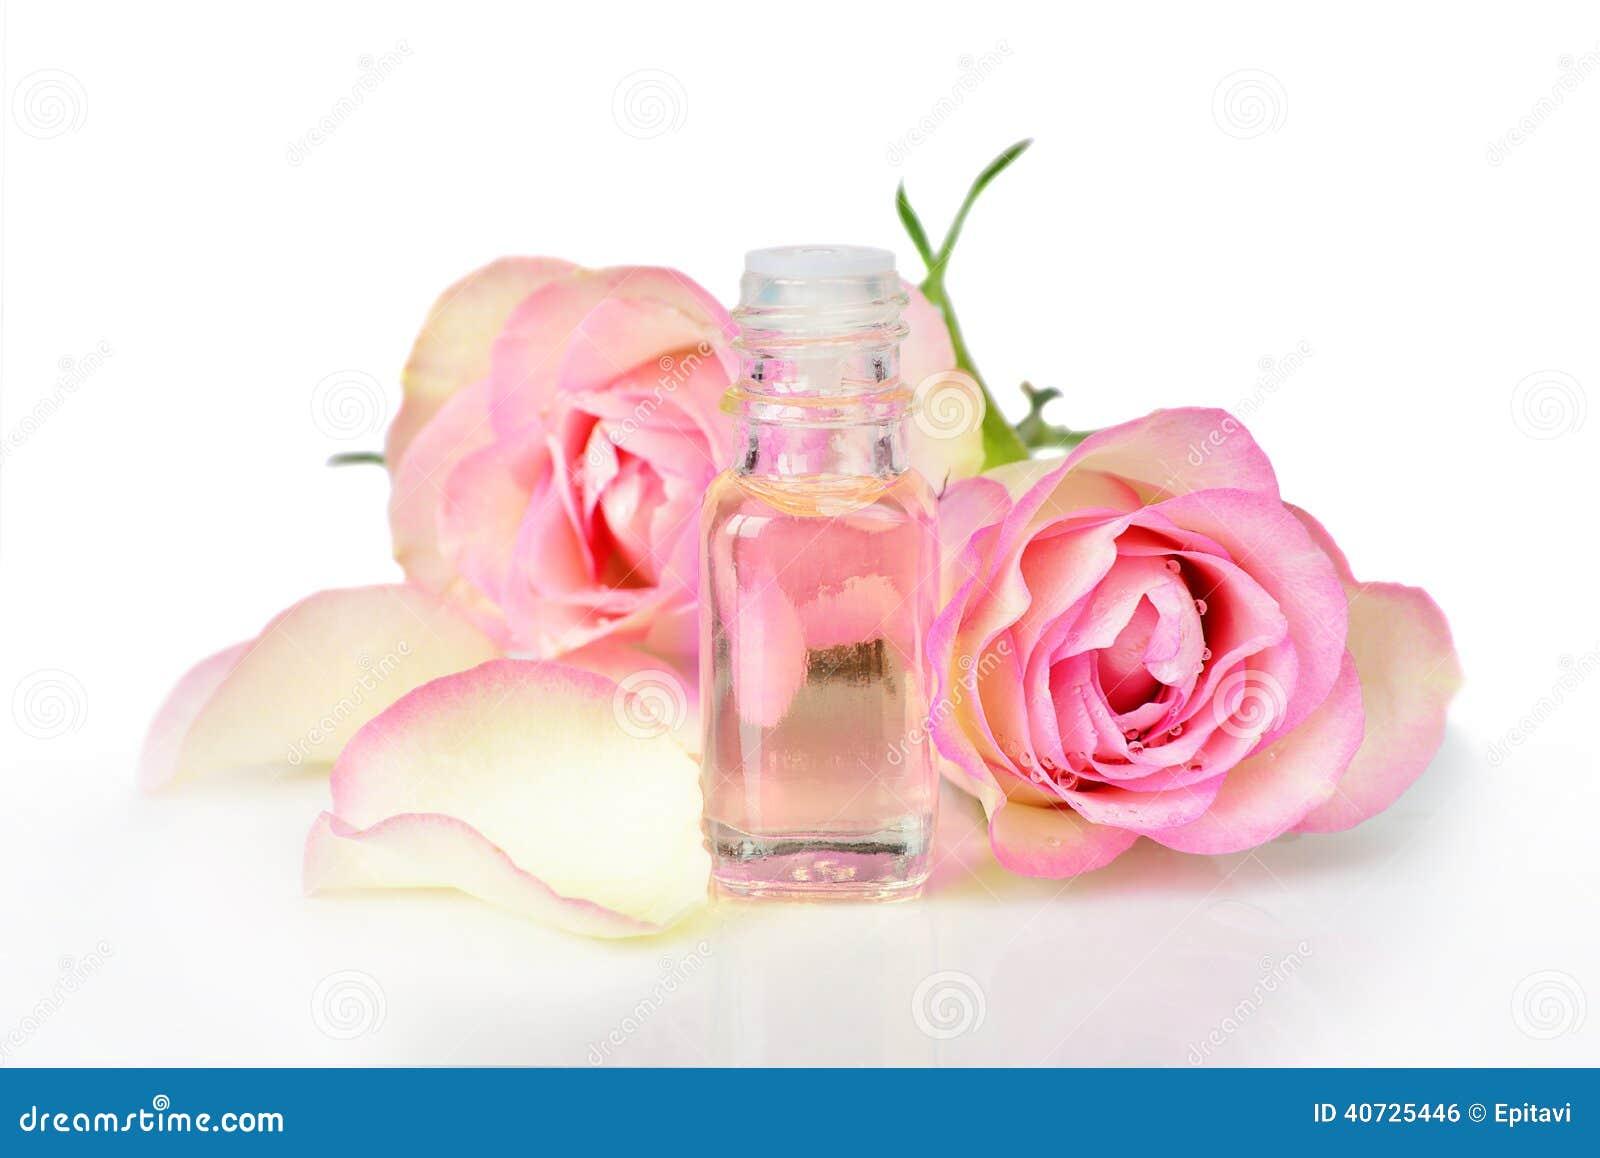 Rose Essential Oil Stock Photo Image 40725446